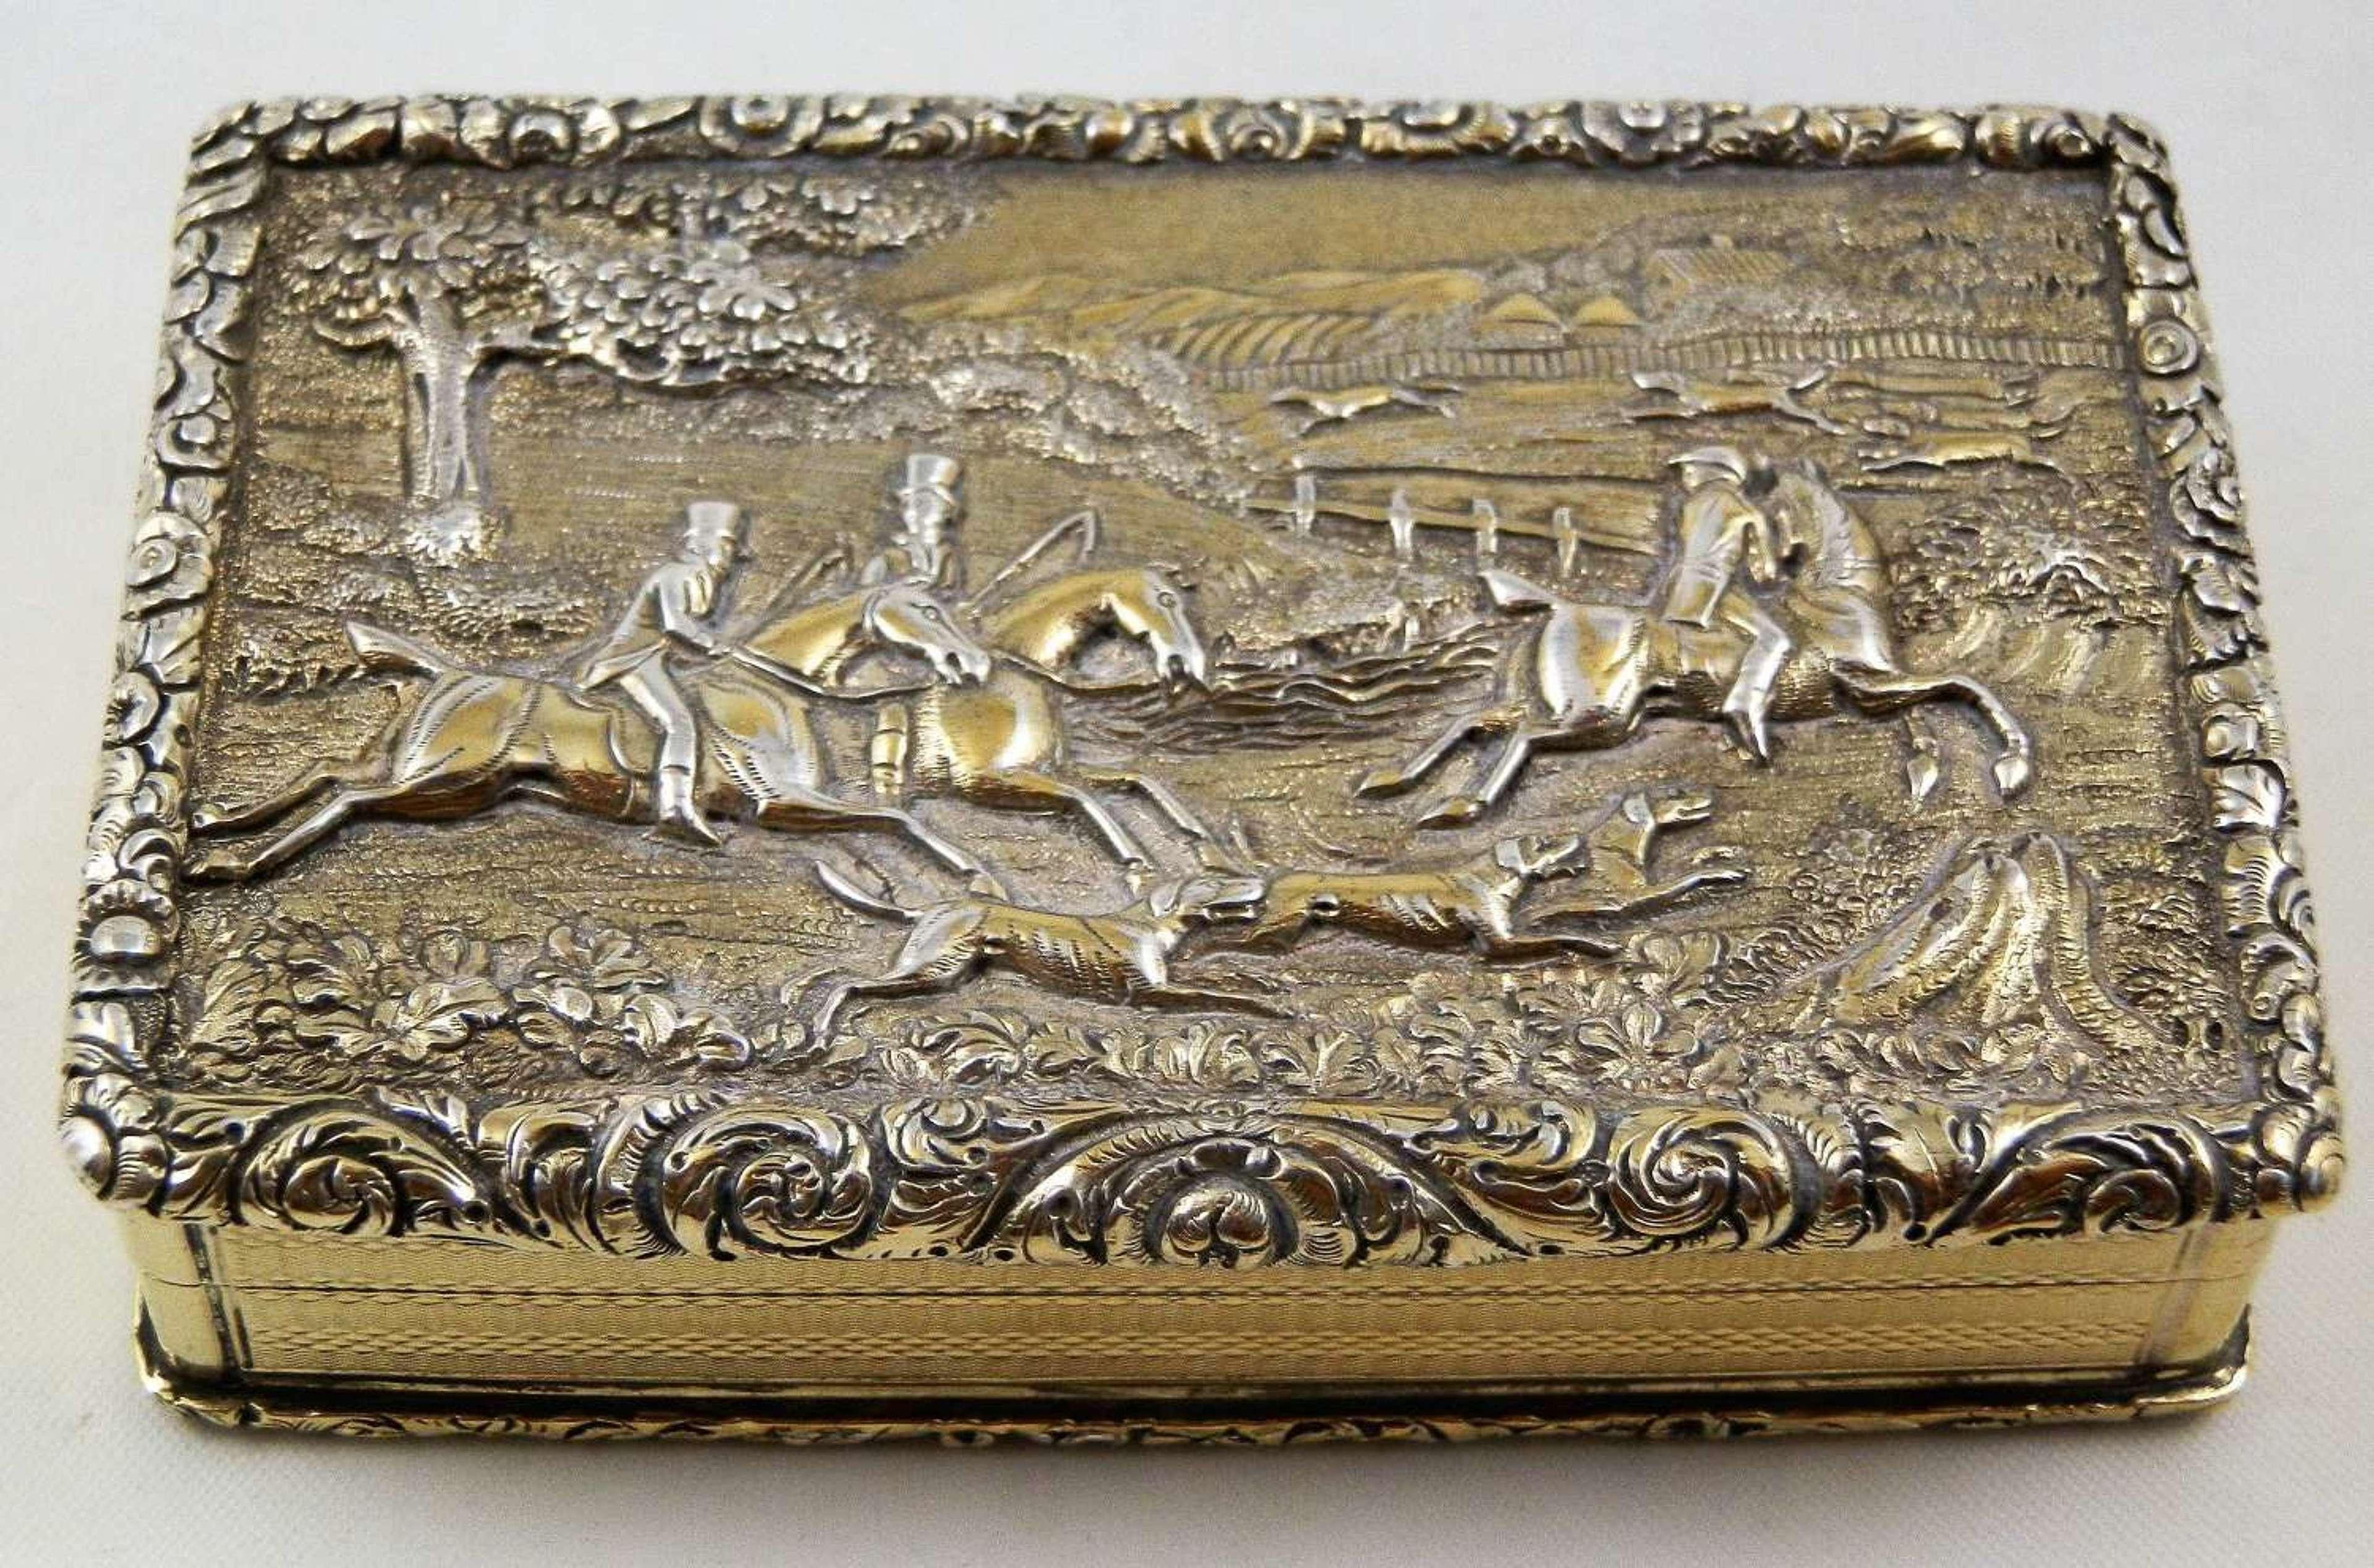 A George IV hunting scene silver gilt table snuff box, 1829